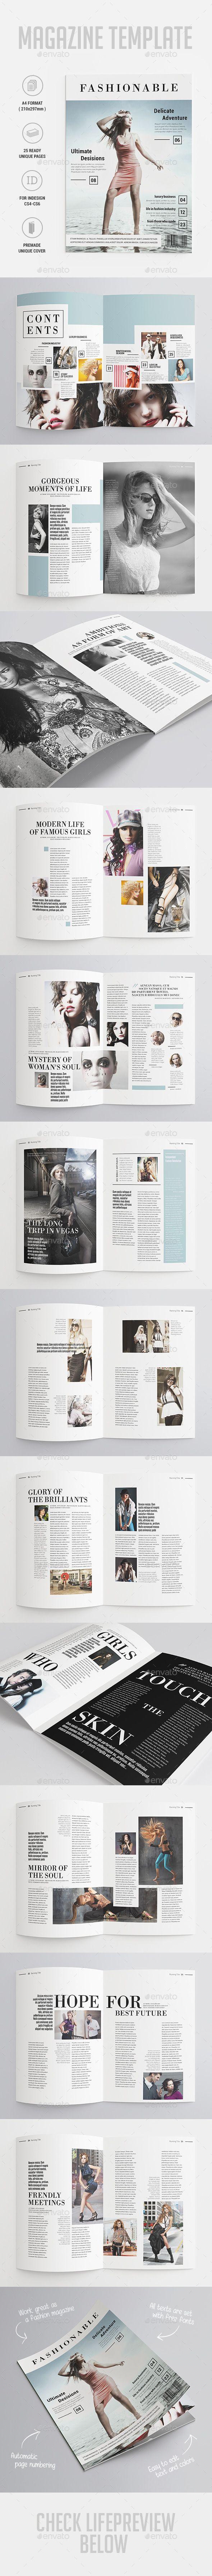 Fashion Magazine | Layouts, Magazines and Magazine layouts